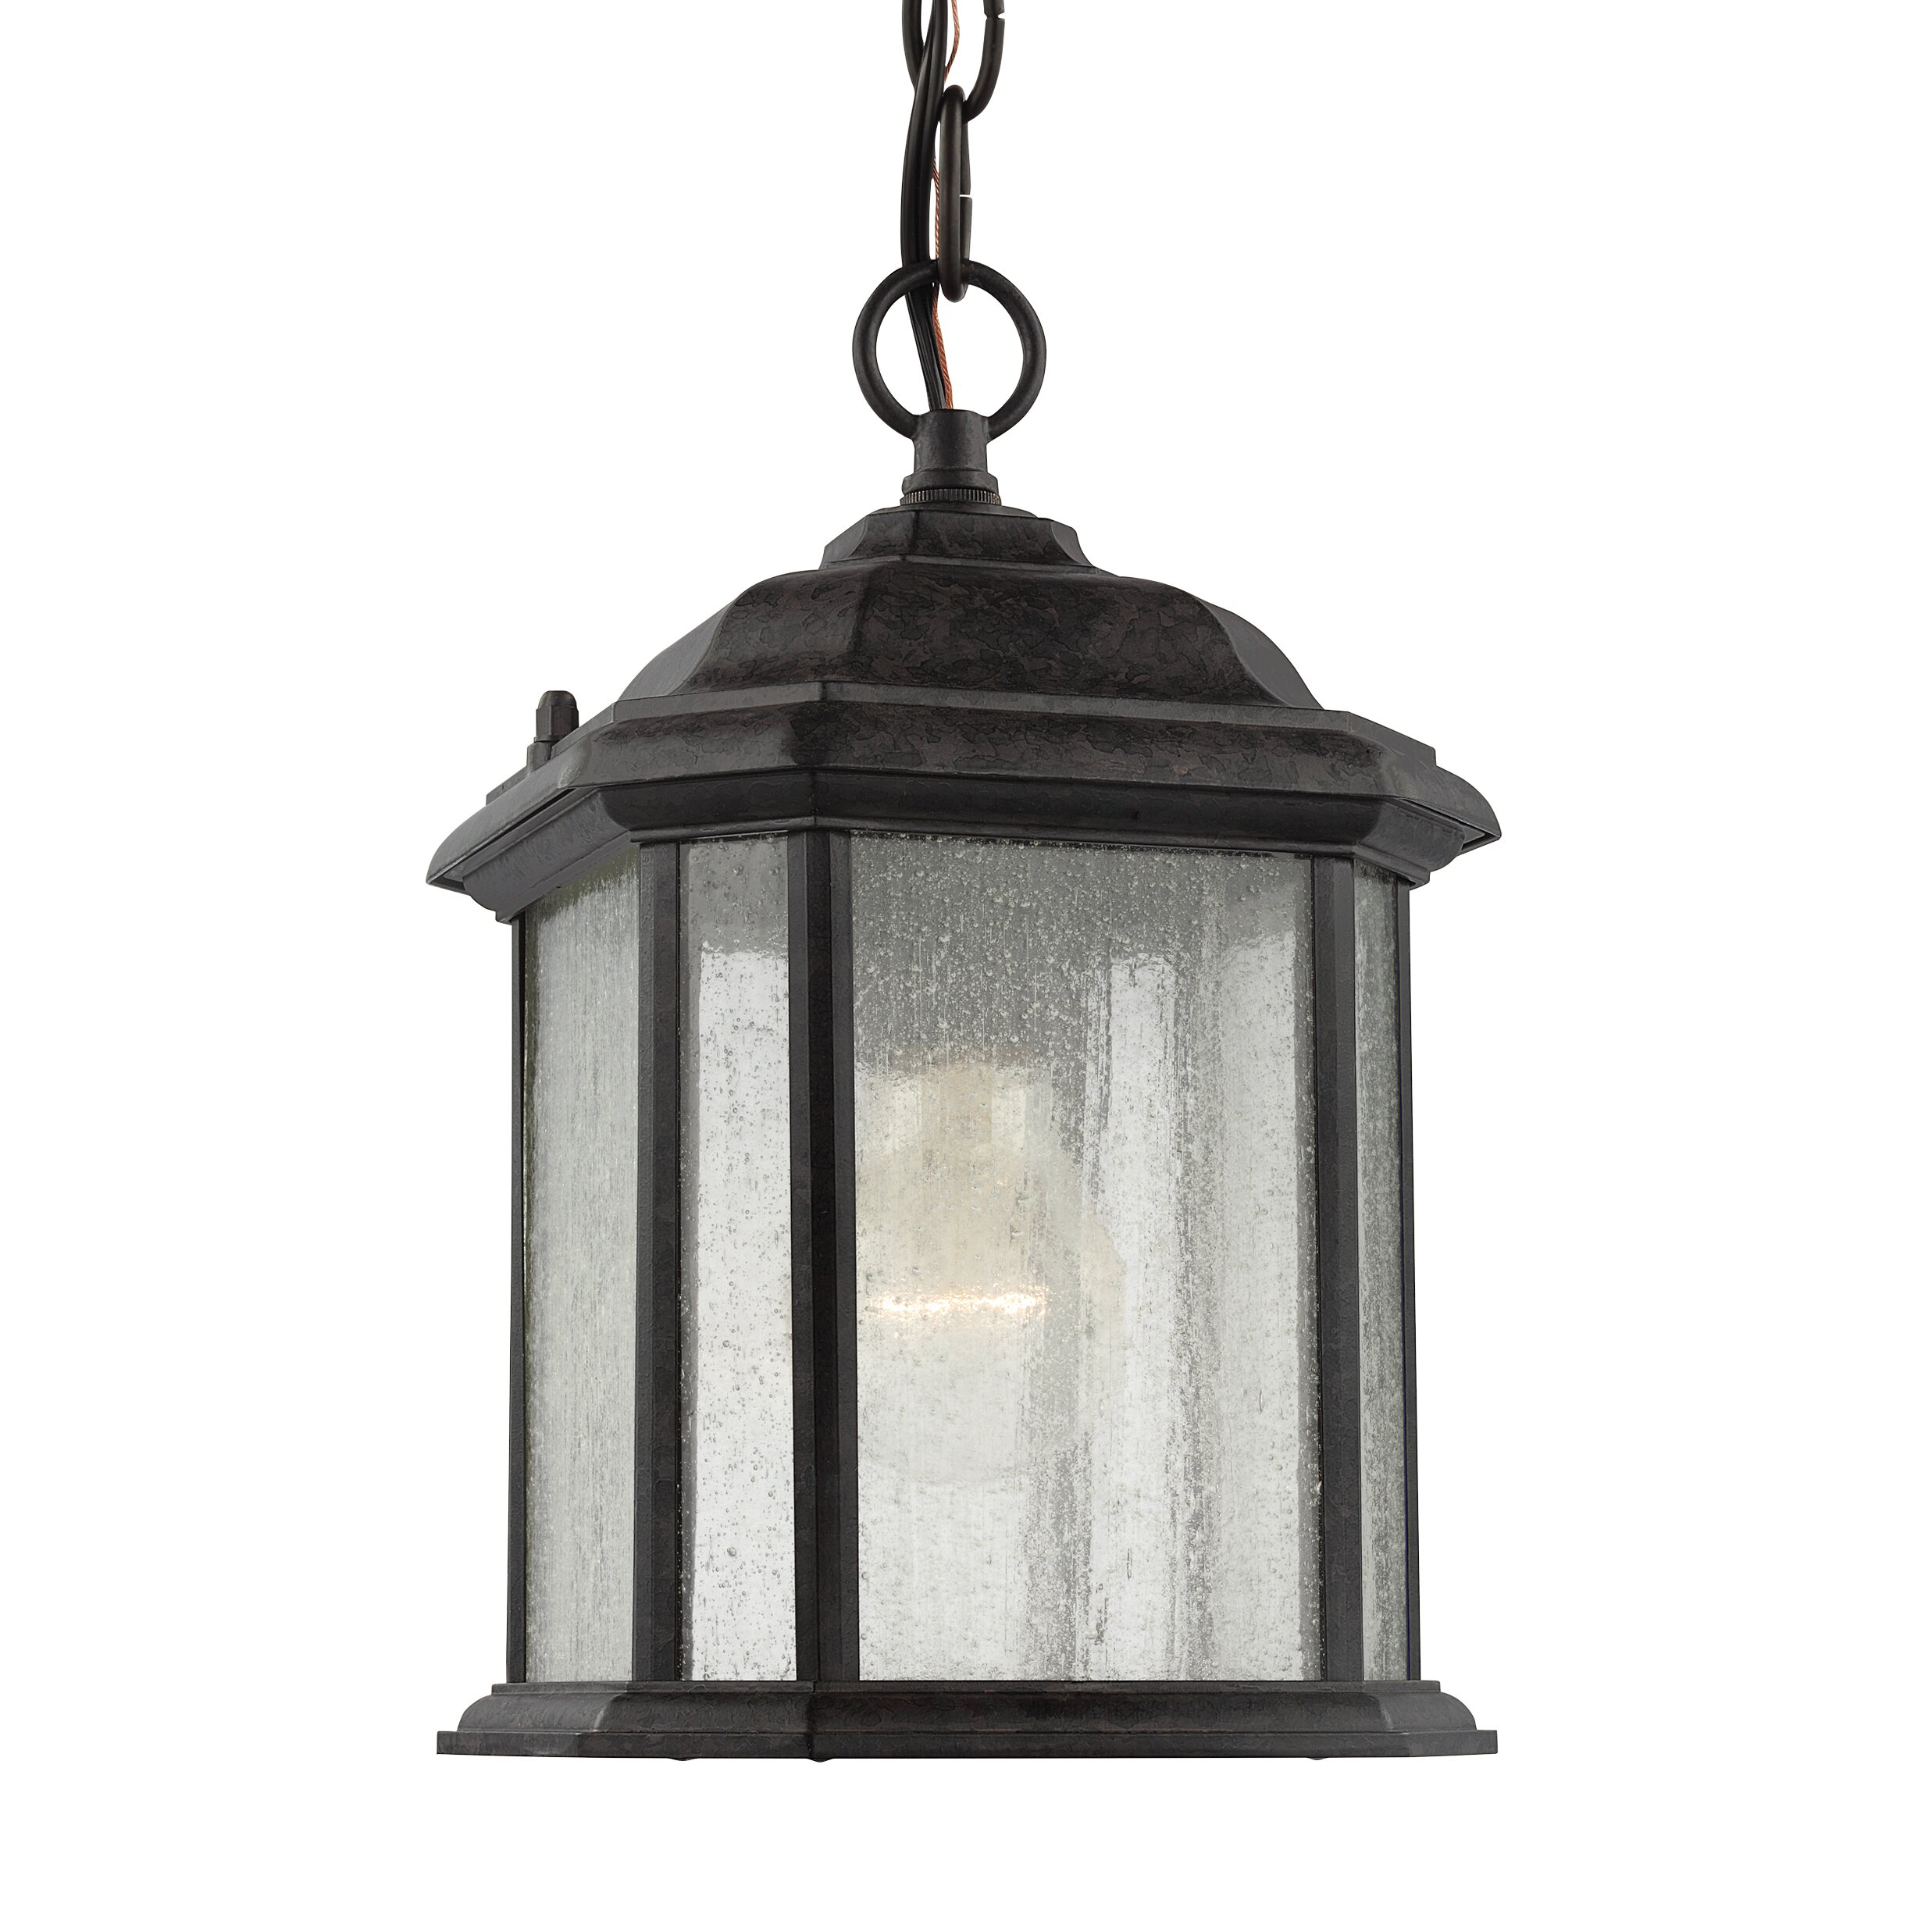 Wayfair Outdoor Hanging Lights: Kent 1 Light Outdoor Hanging Lantern